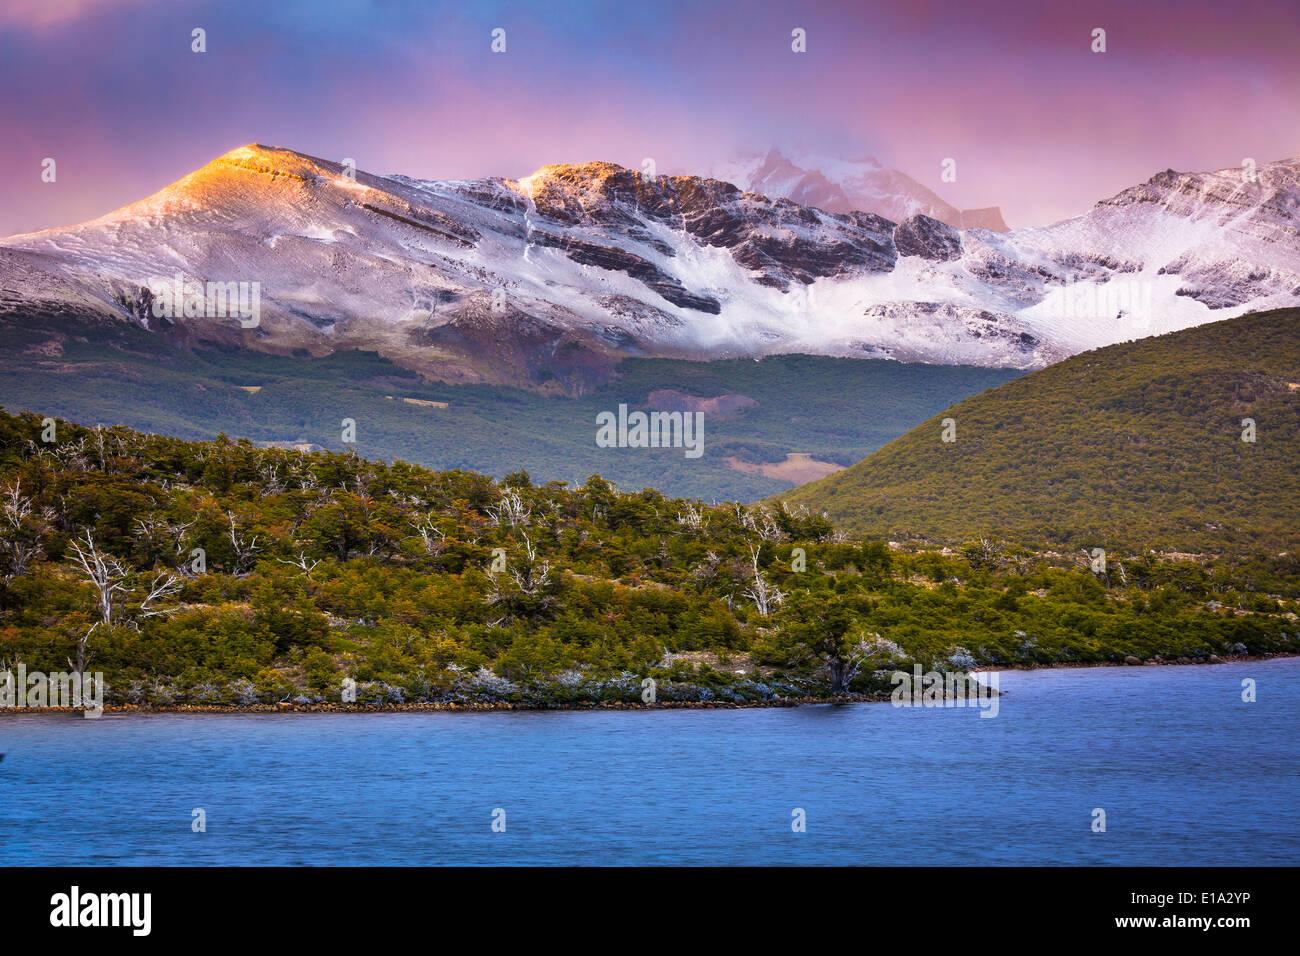 Laguna Capri, cerca de lago de El Chaltén, en la parte de la Patagonia Argentina Imagen De Stock